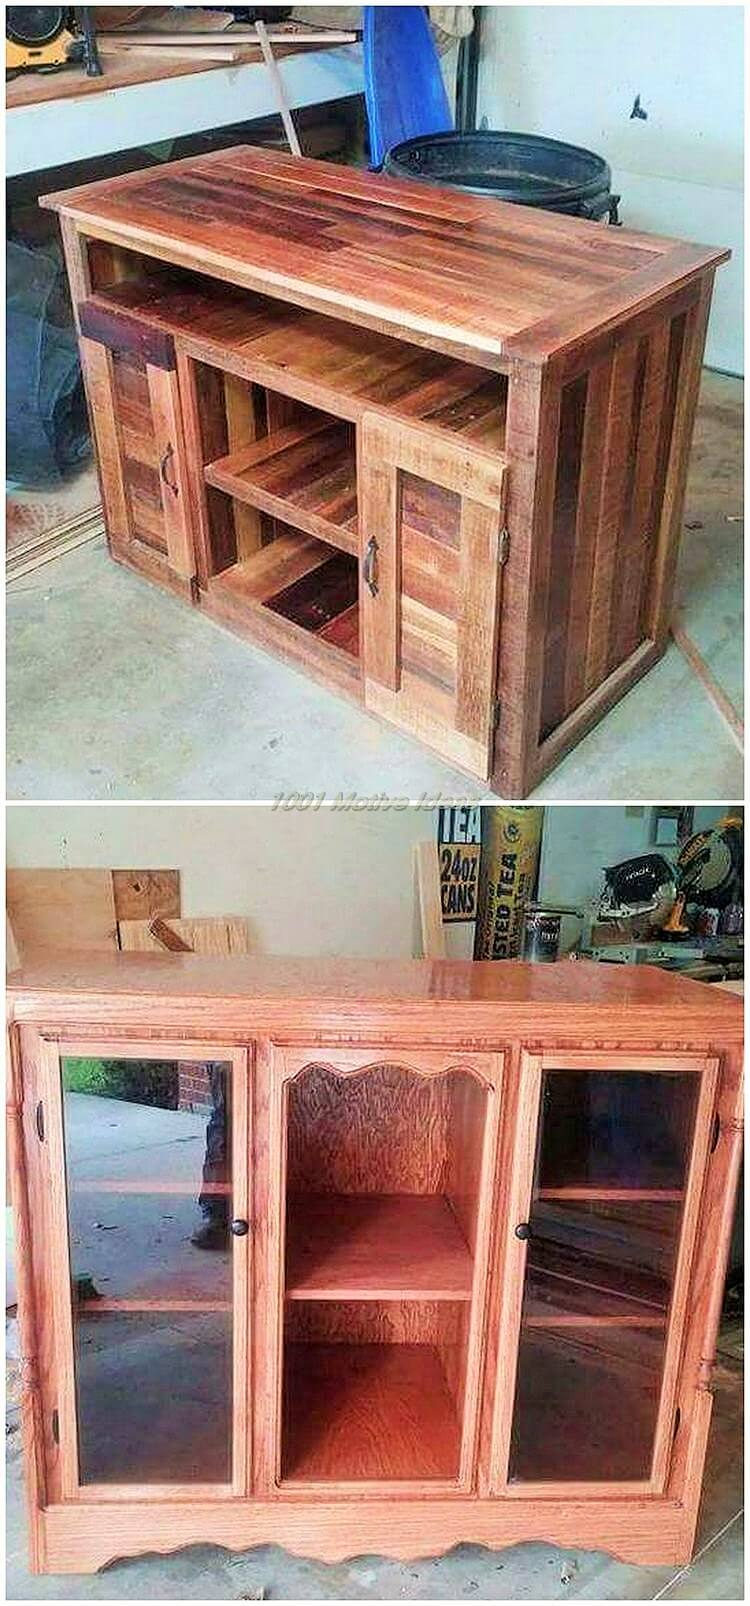 wooden-Pallet-Kitchen-furniture-Project-Ideas-006